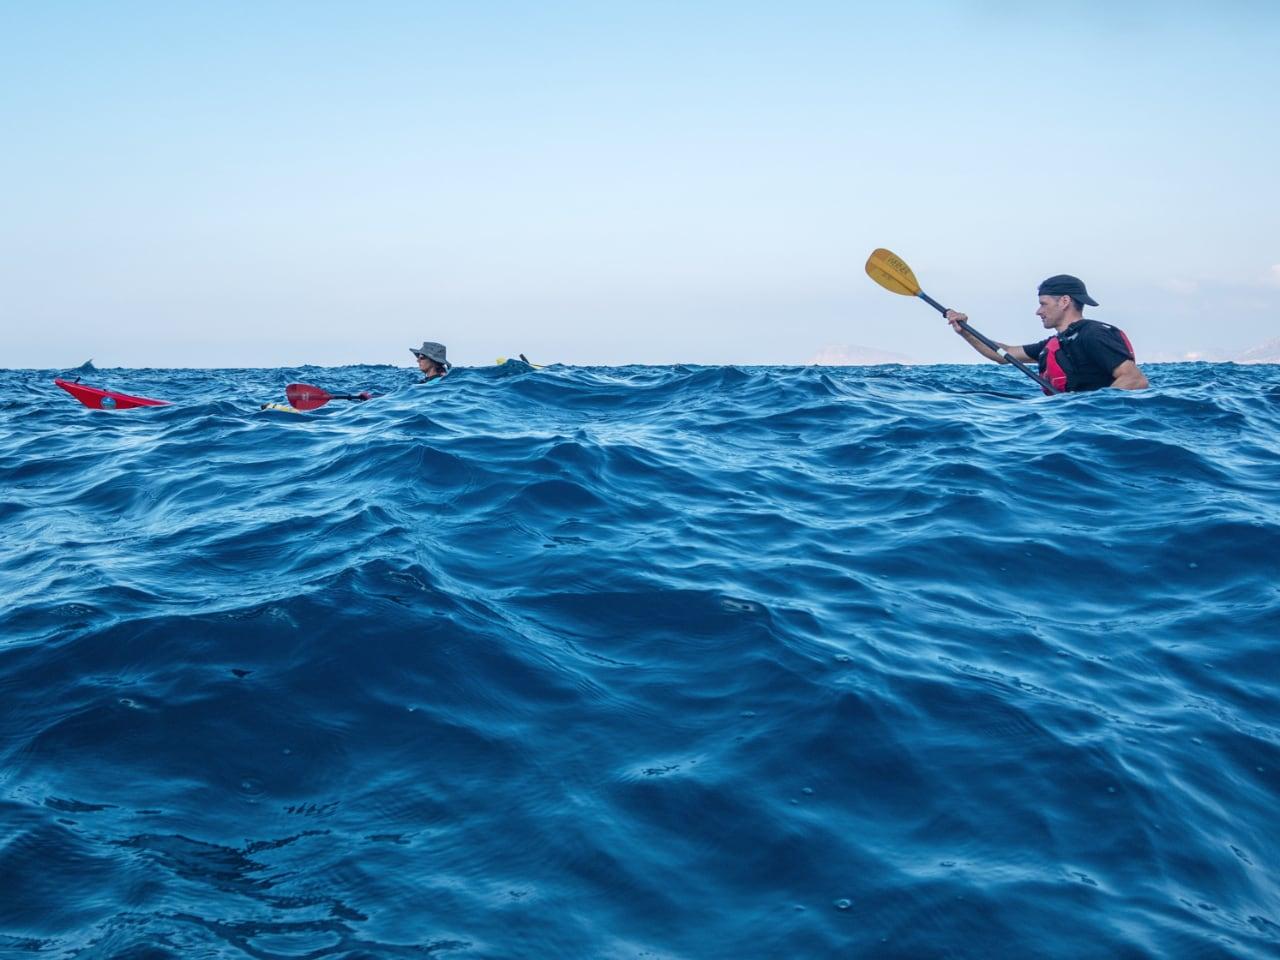 Sea Kayaking - Level 2 Sea Kayak Course, Level 2 Sea Kayak Course crete, Sea Kayaking best course crete, sea kayak lesson nearby heraklion